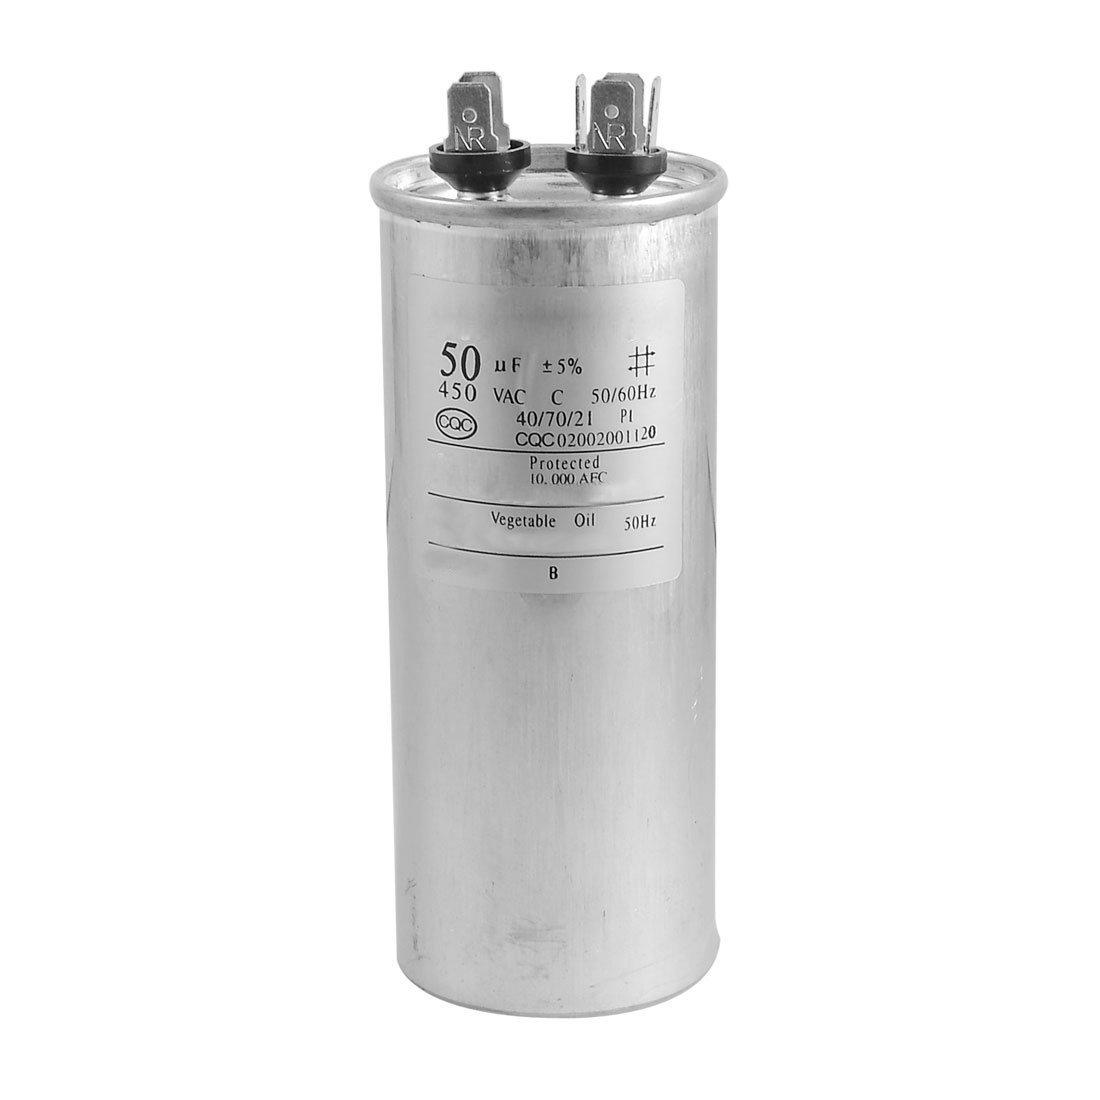 SODIAL(R) CBB65A-1 50uF AC 450V Motor Capacitor for Air Conditioner Engine